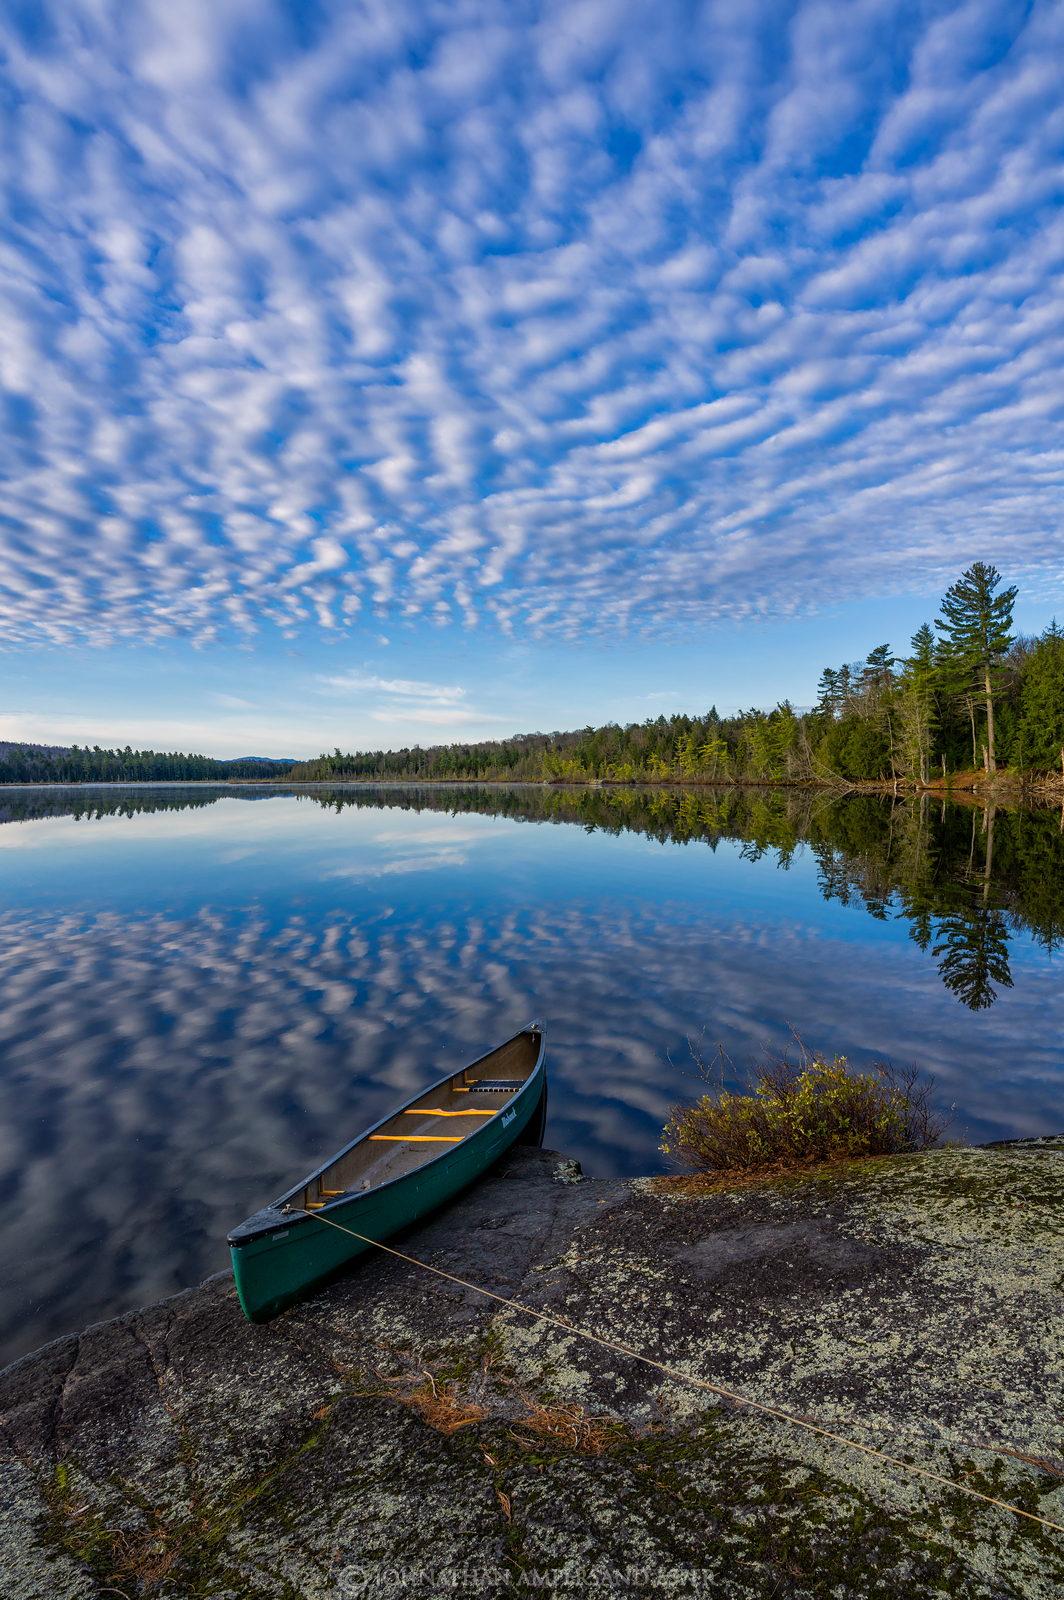 Peters Rock,Lower St. Regis Lake,Lower St Regis Lake,St Regis Lake,St. Regis Lake,cloud patterns,clouds,reflection,cloud reflection...